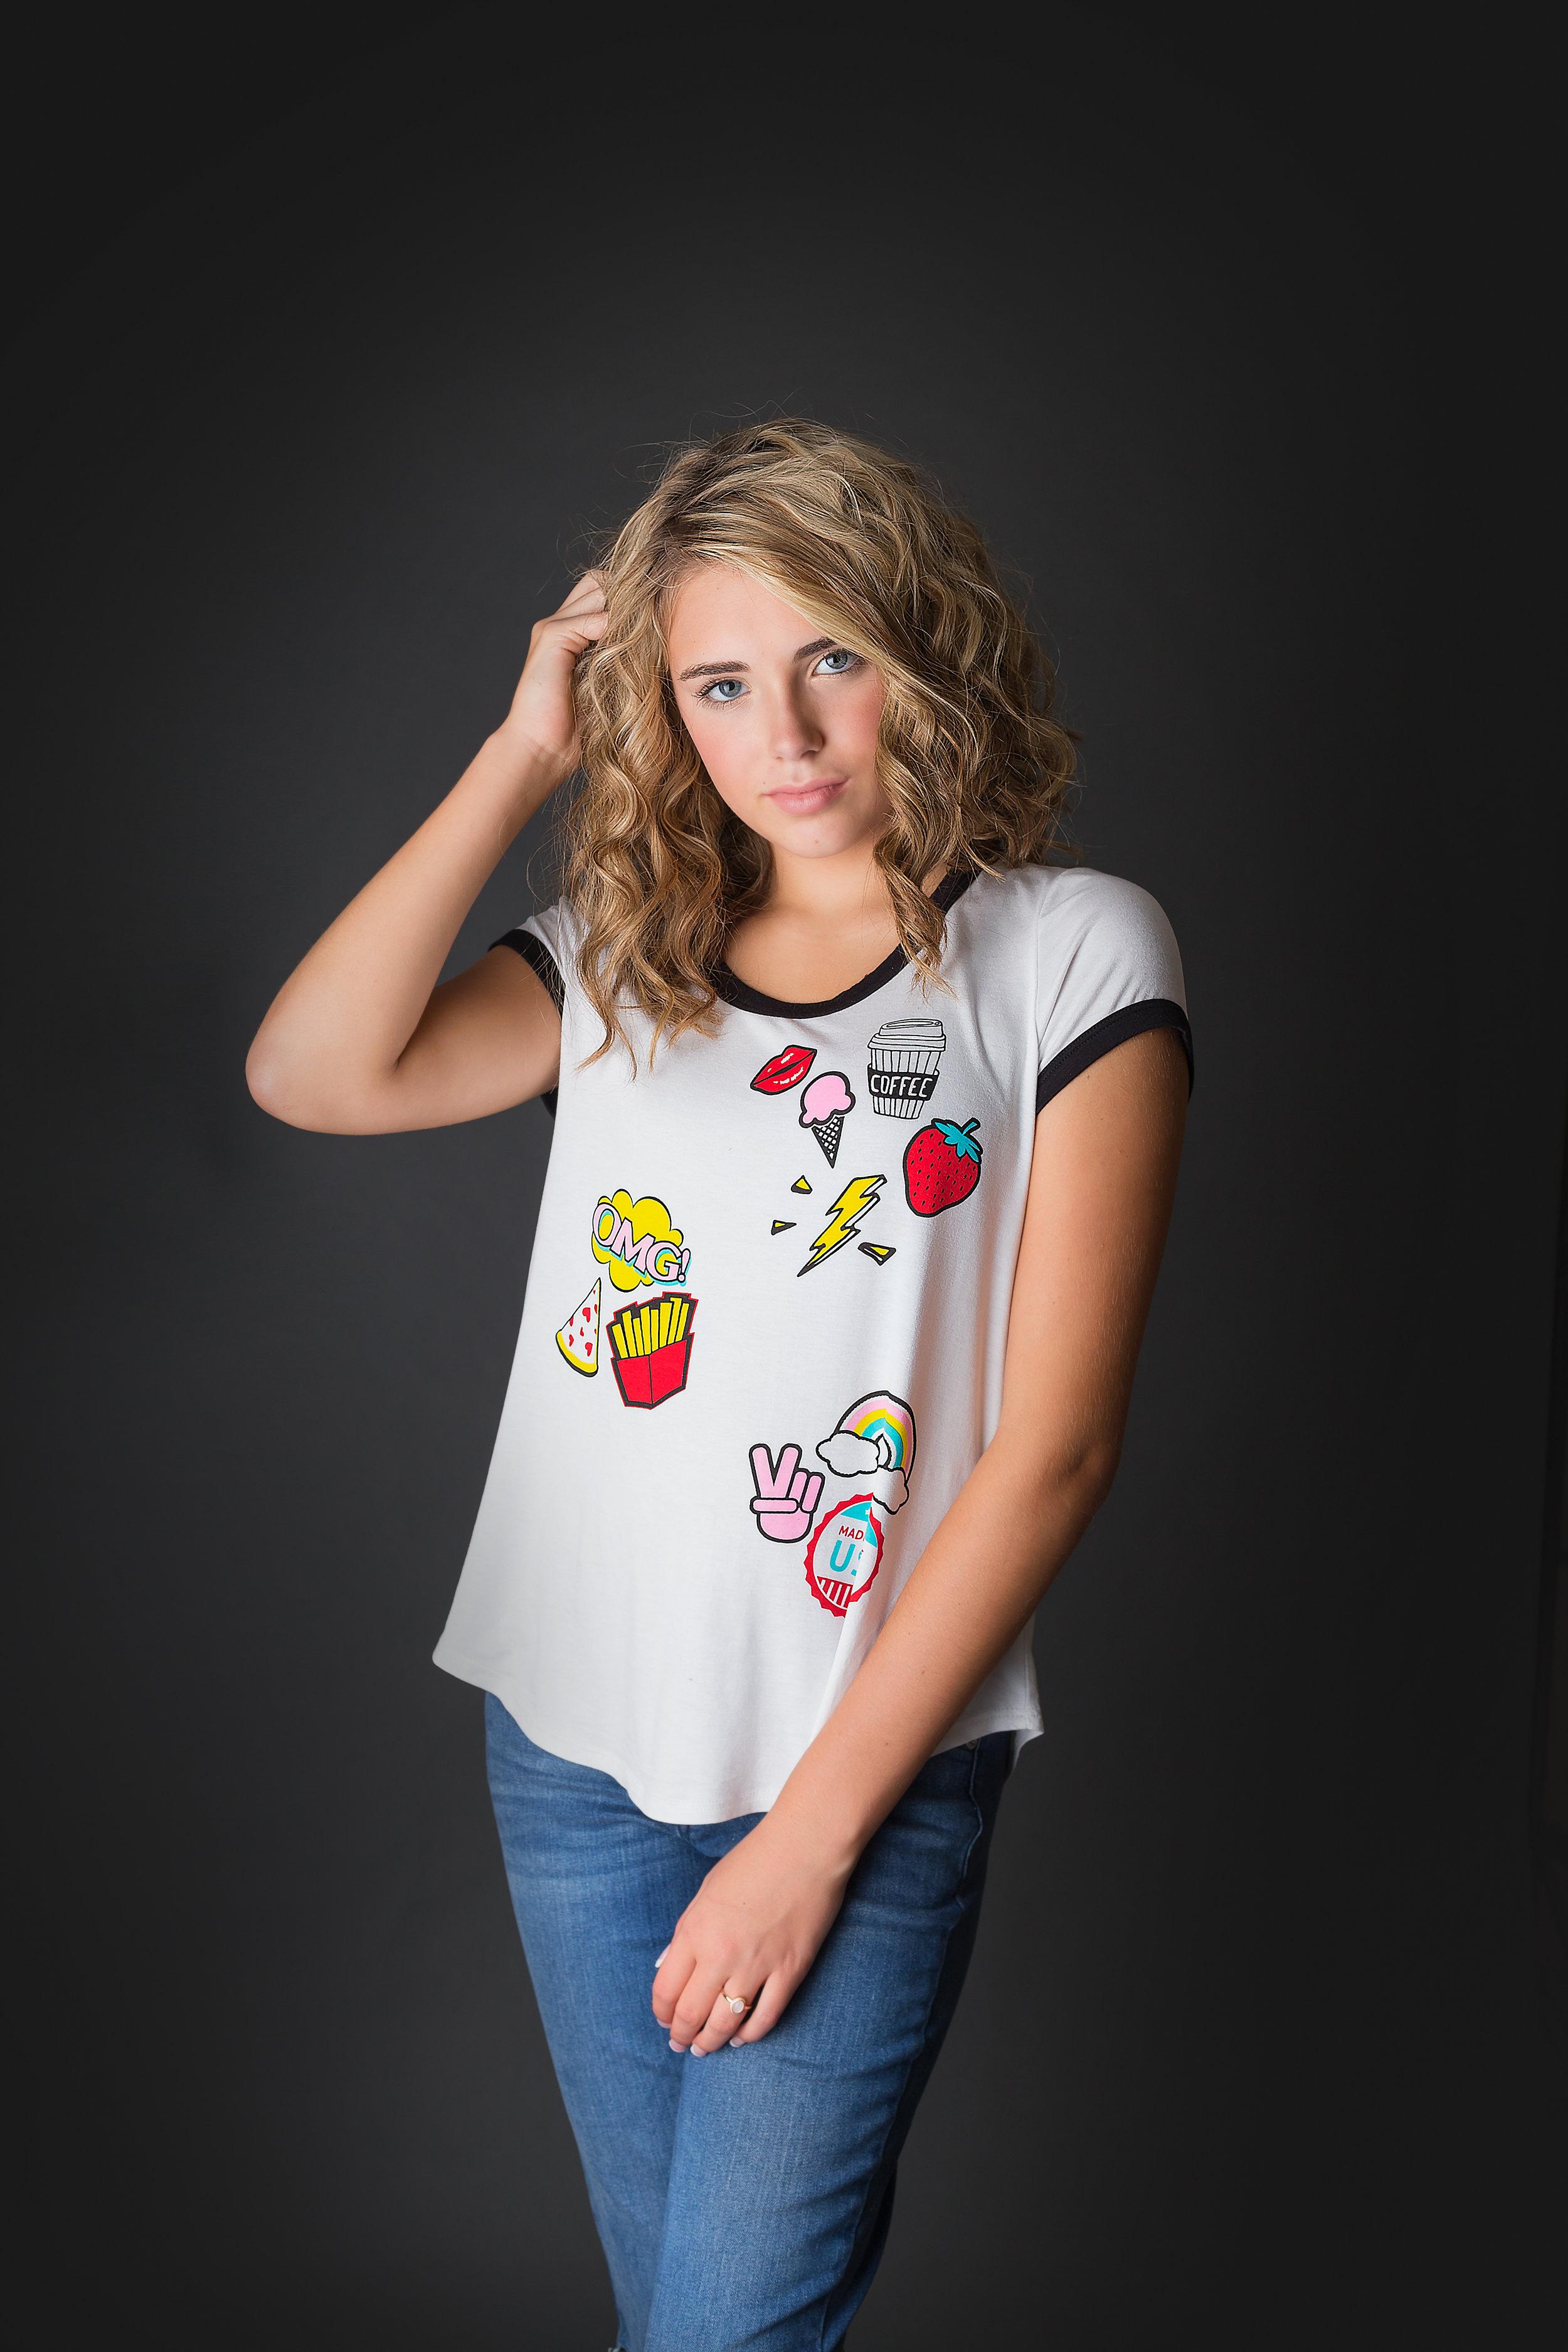 Houston Child Model Photographer | Maribella Portraits, LLC | www.maribellaportraits.rocks